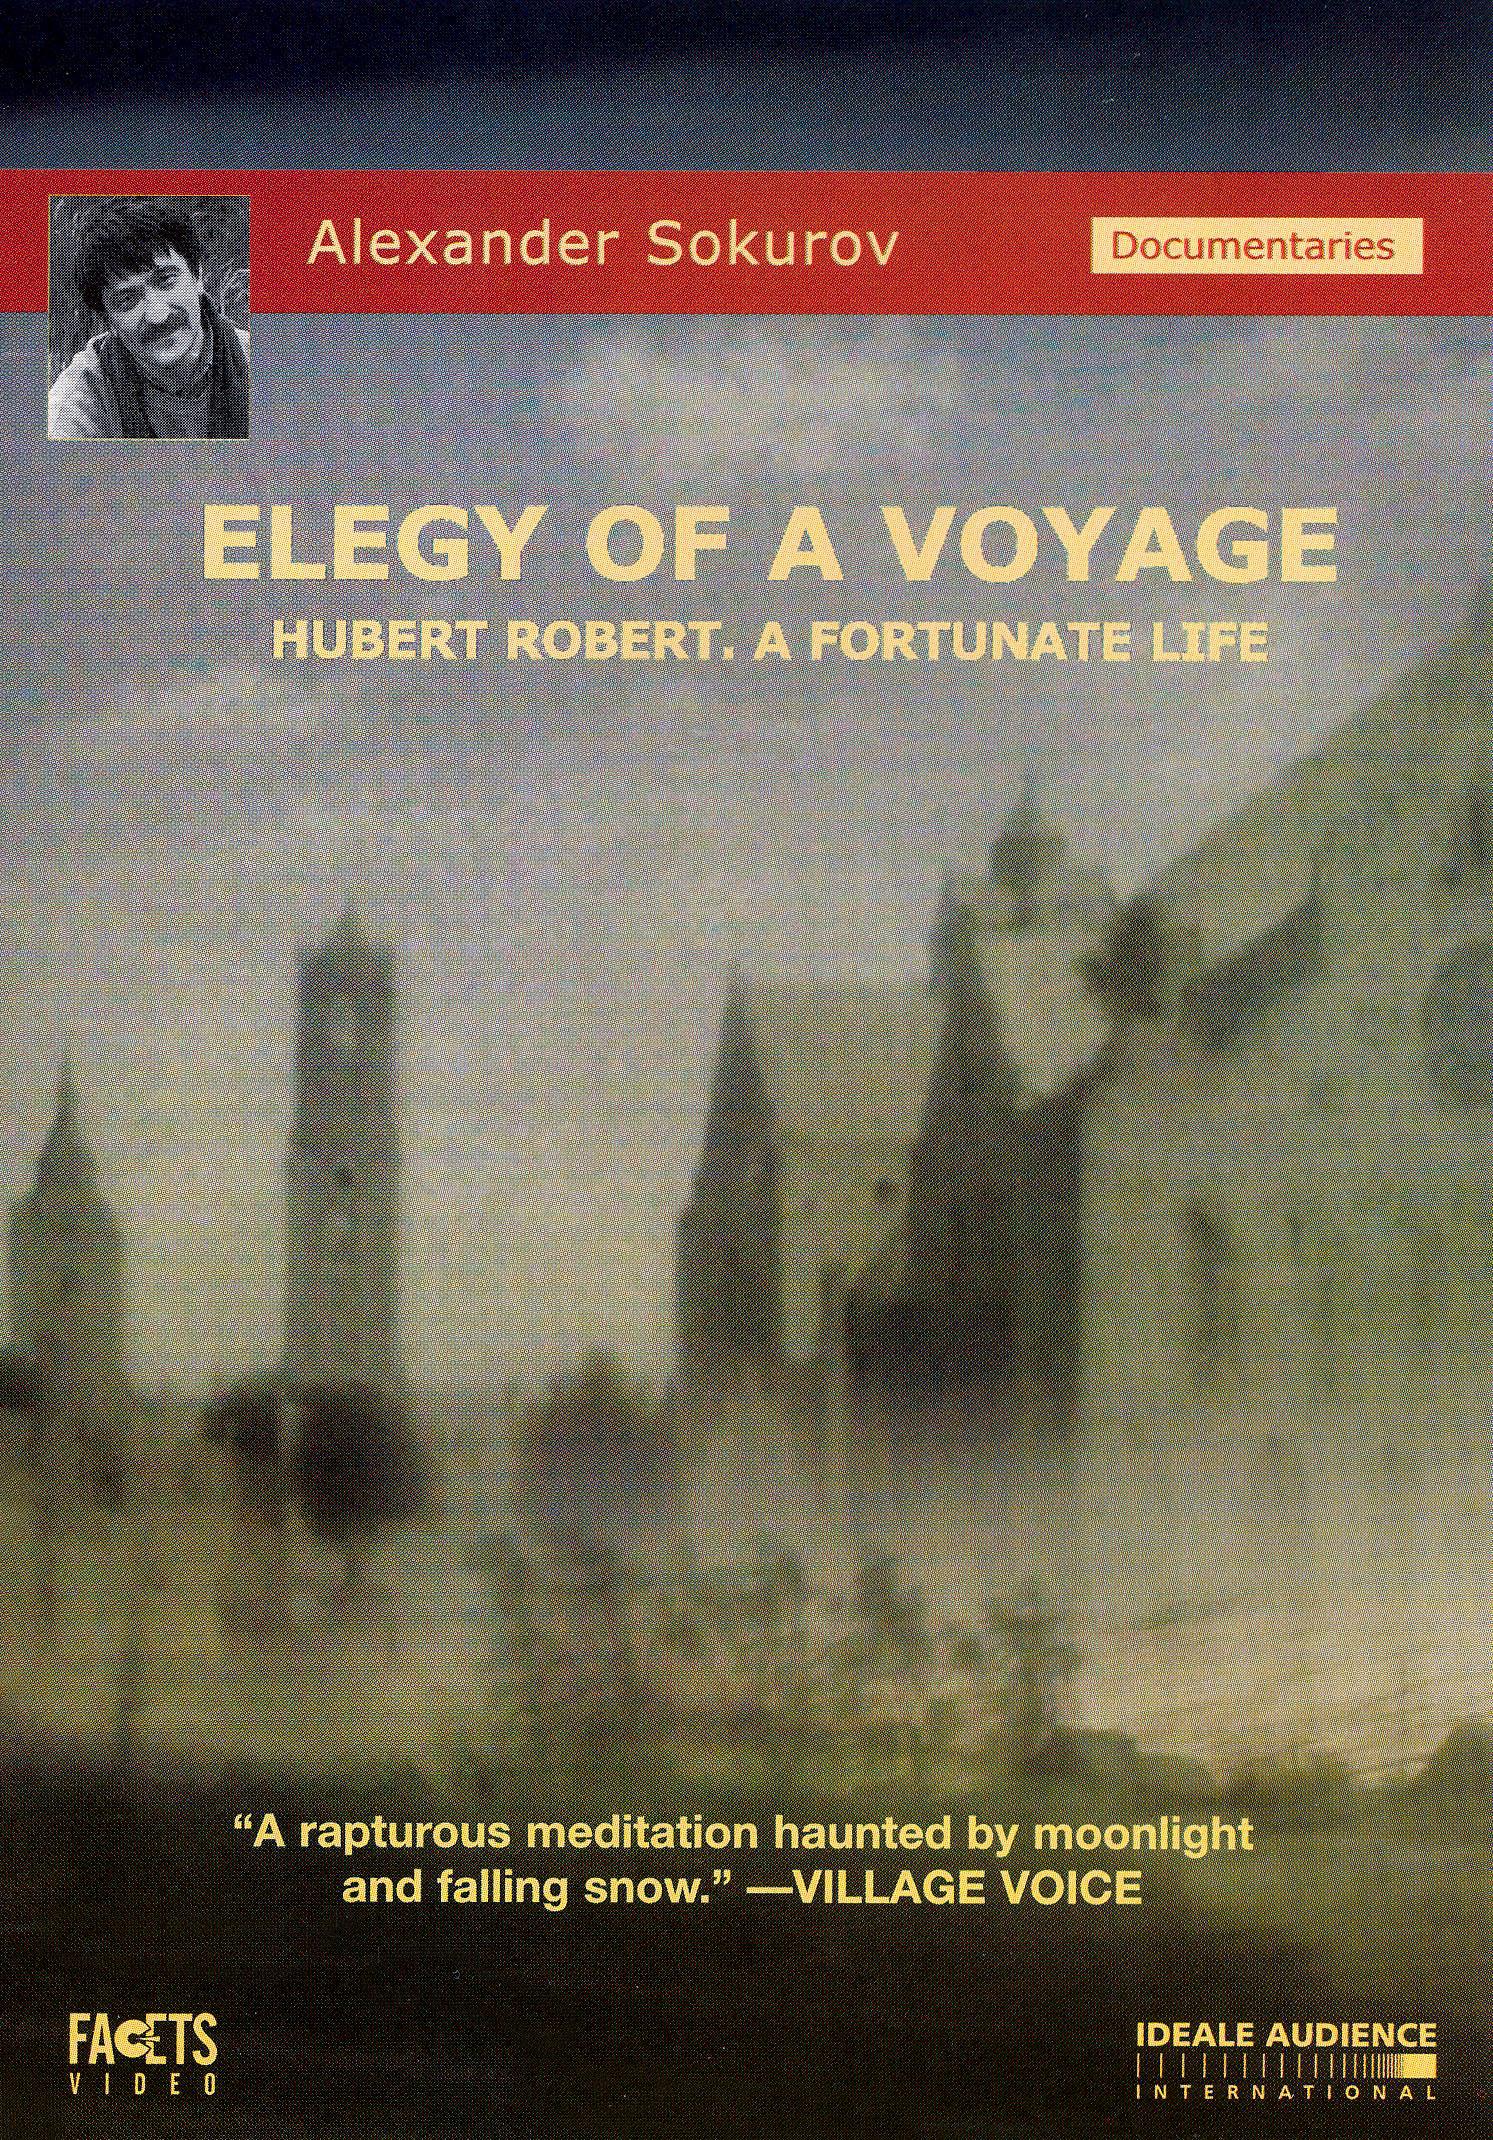 Elegy of a Voyage